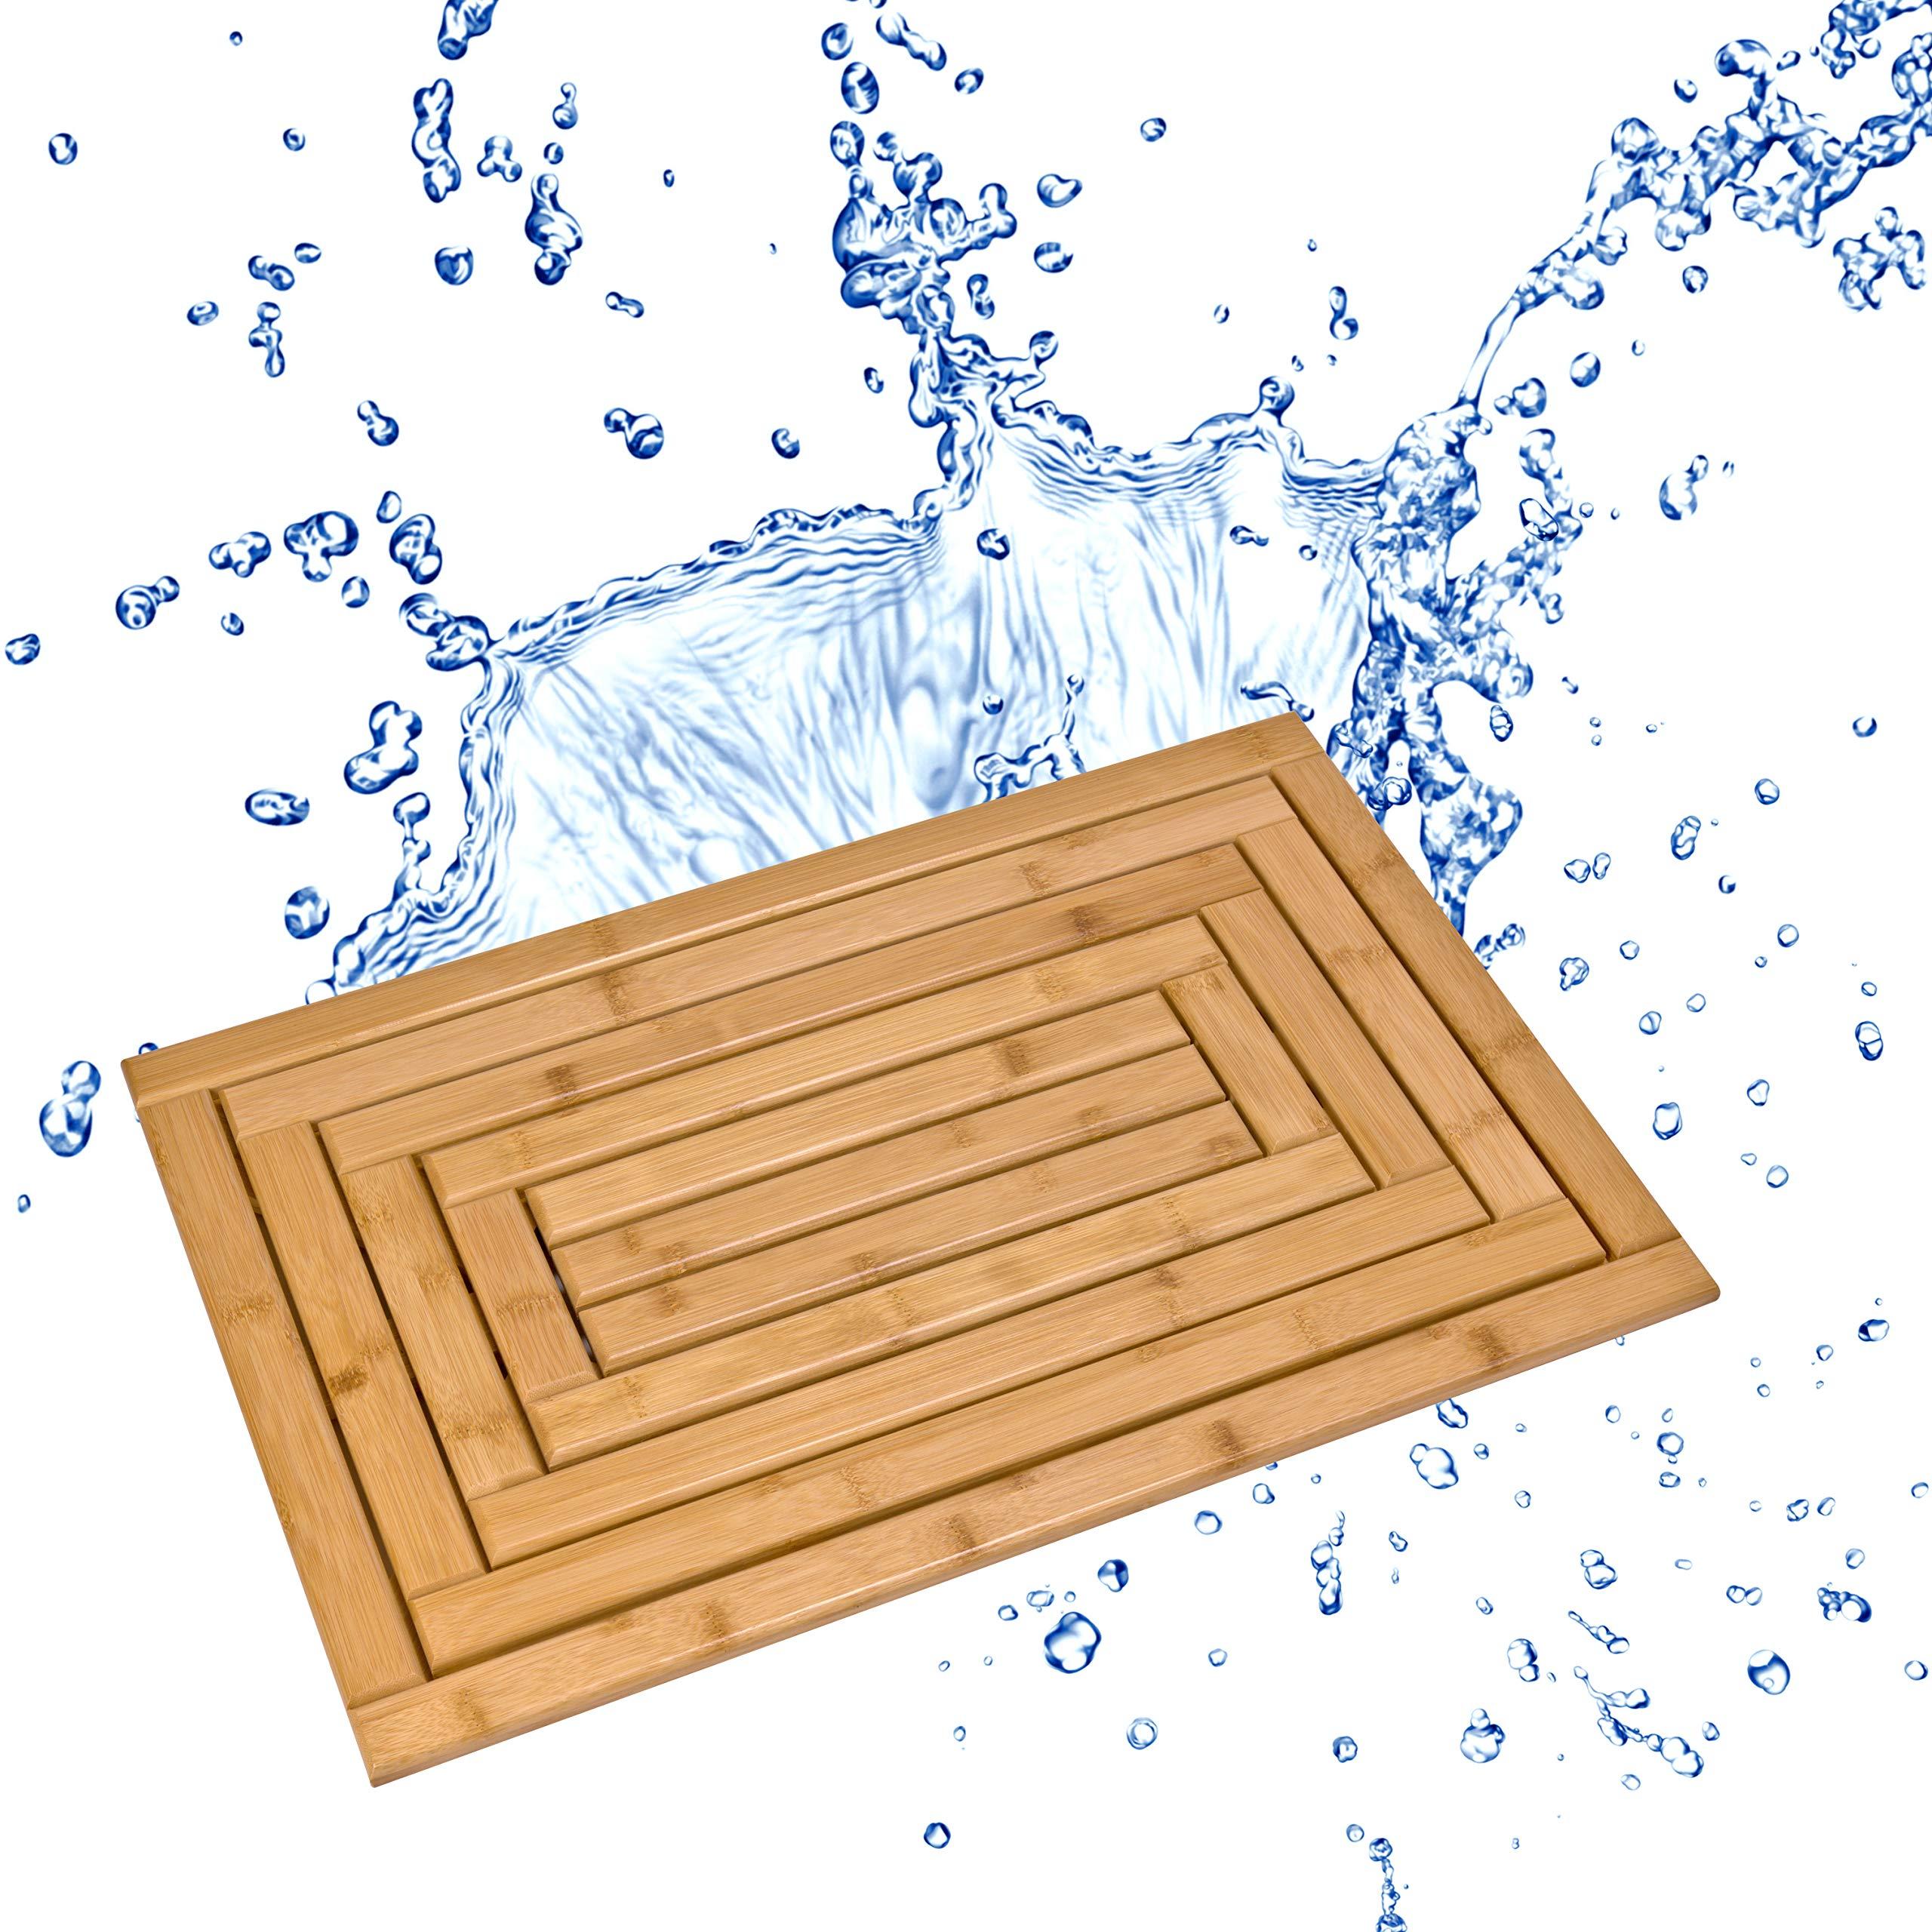 "Bula Home Bamboo Bath Mat | Beautiful, Non Slip Wood Bath Mat | Natural, Eco-Friendly Wooden Bath Mat | Bamboo Shower Mat or Bathroom Floor Mat Perfect for Any Decor… (24"" x 16"")"